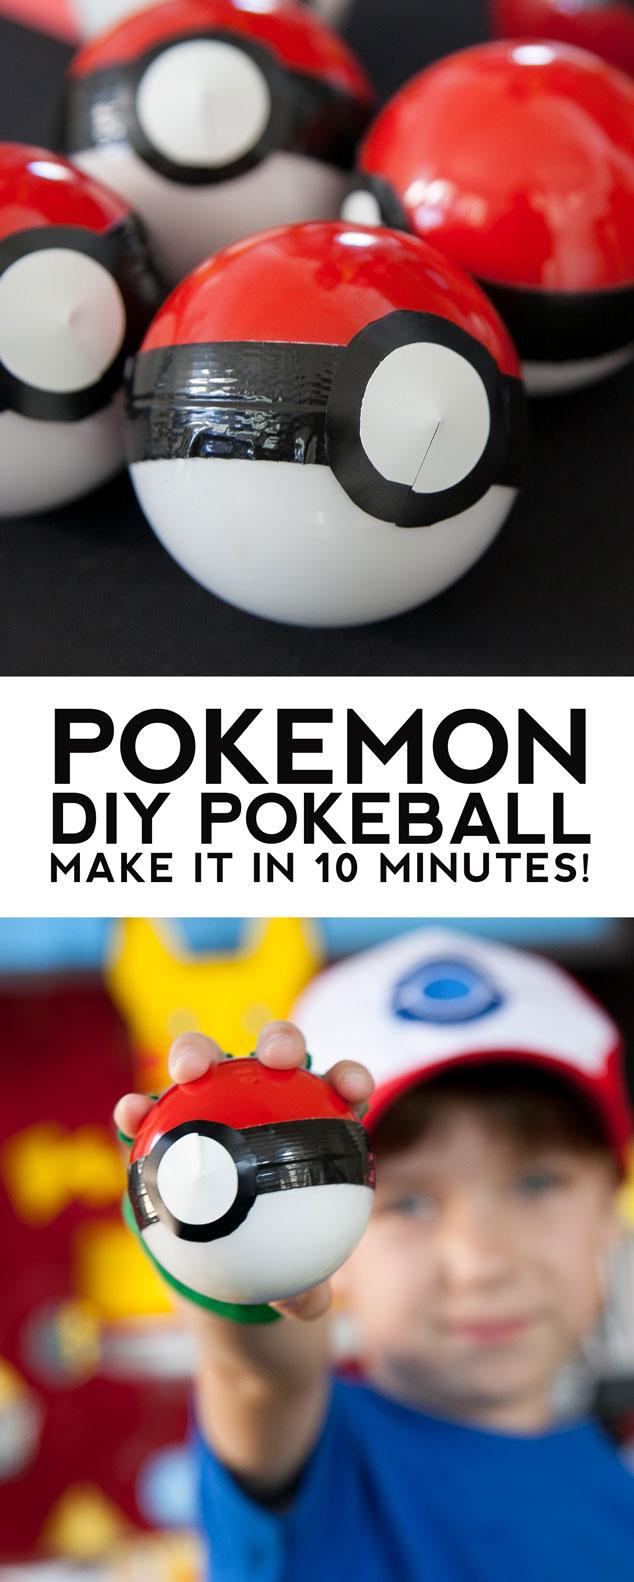 Pokemon-Party-Favor-Pokeballs